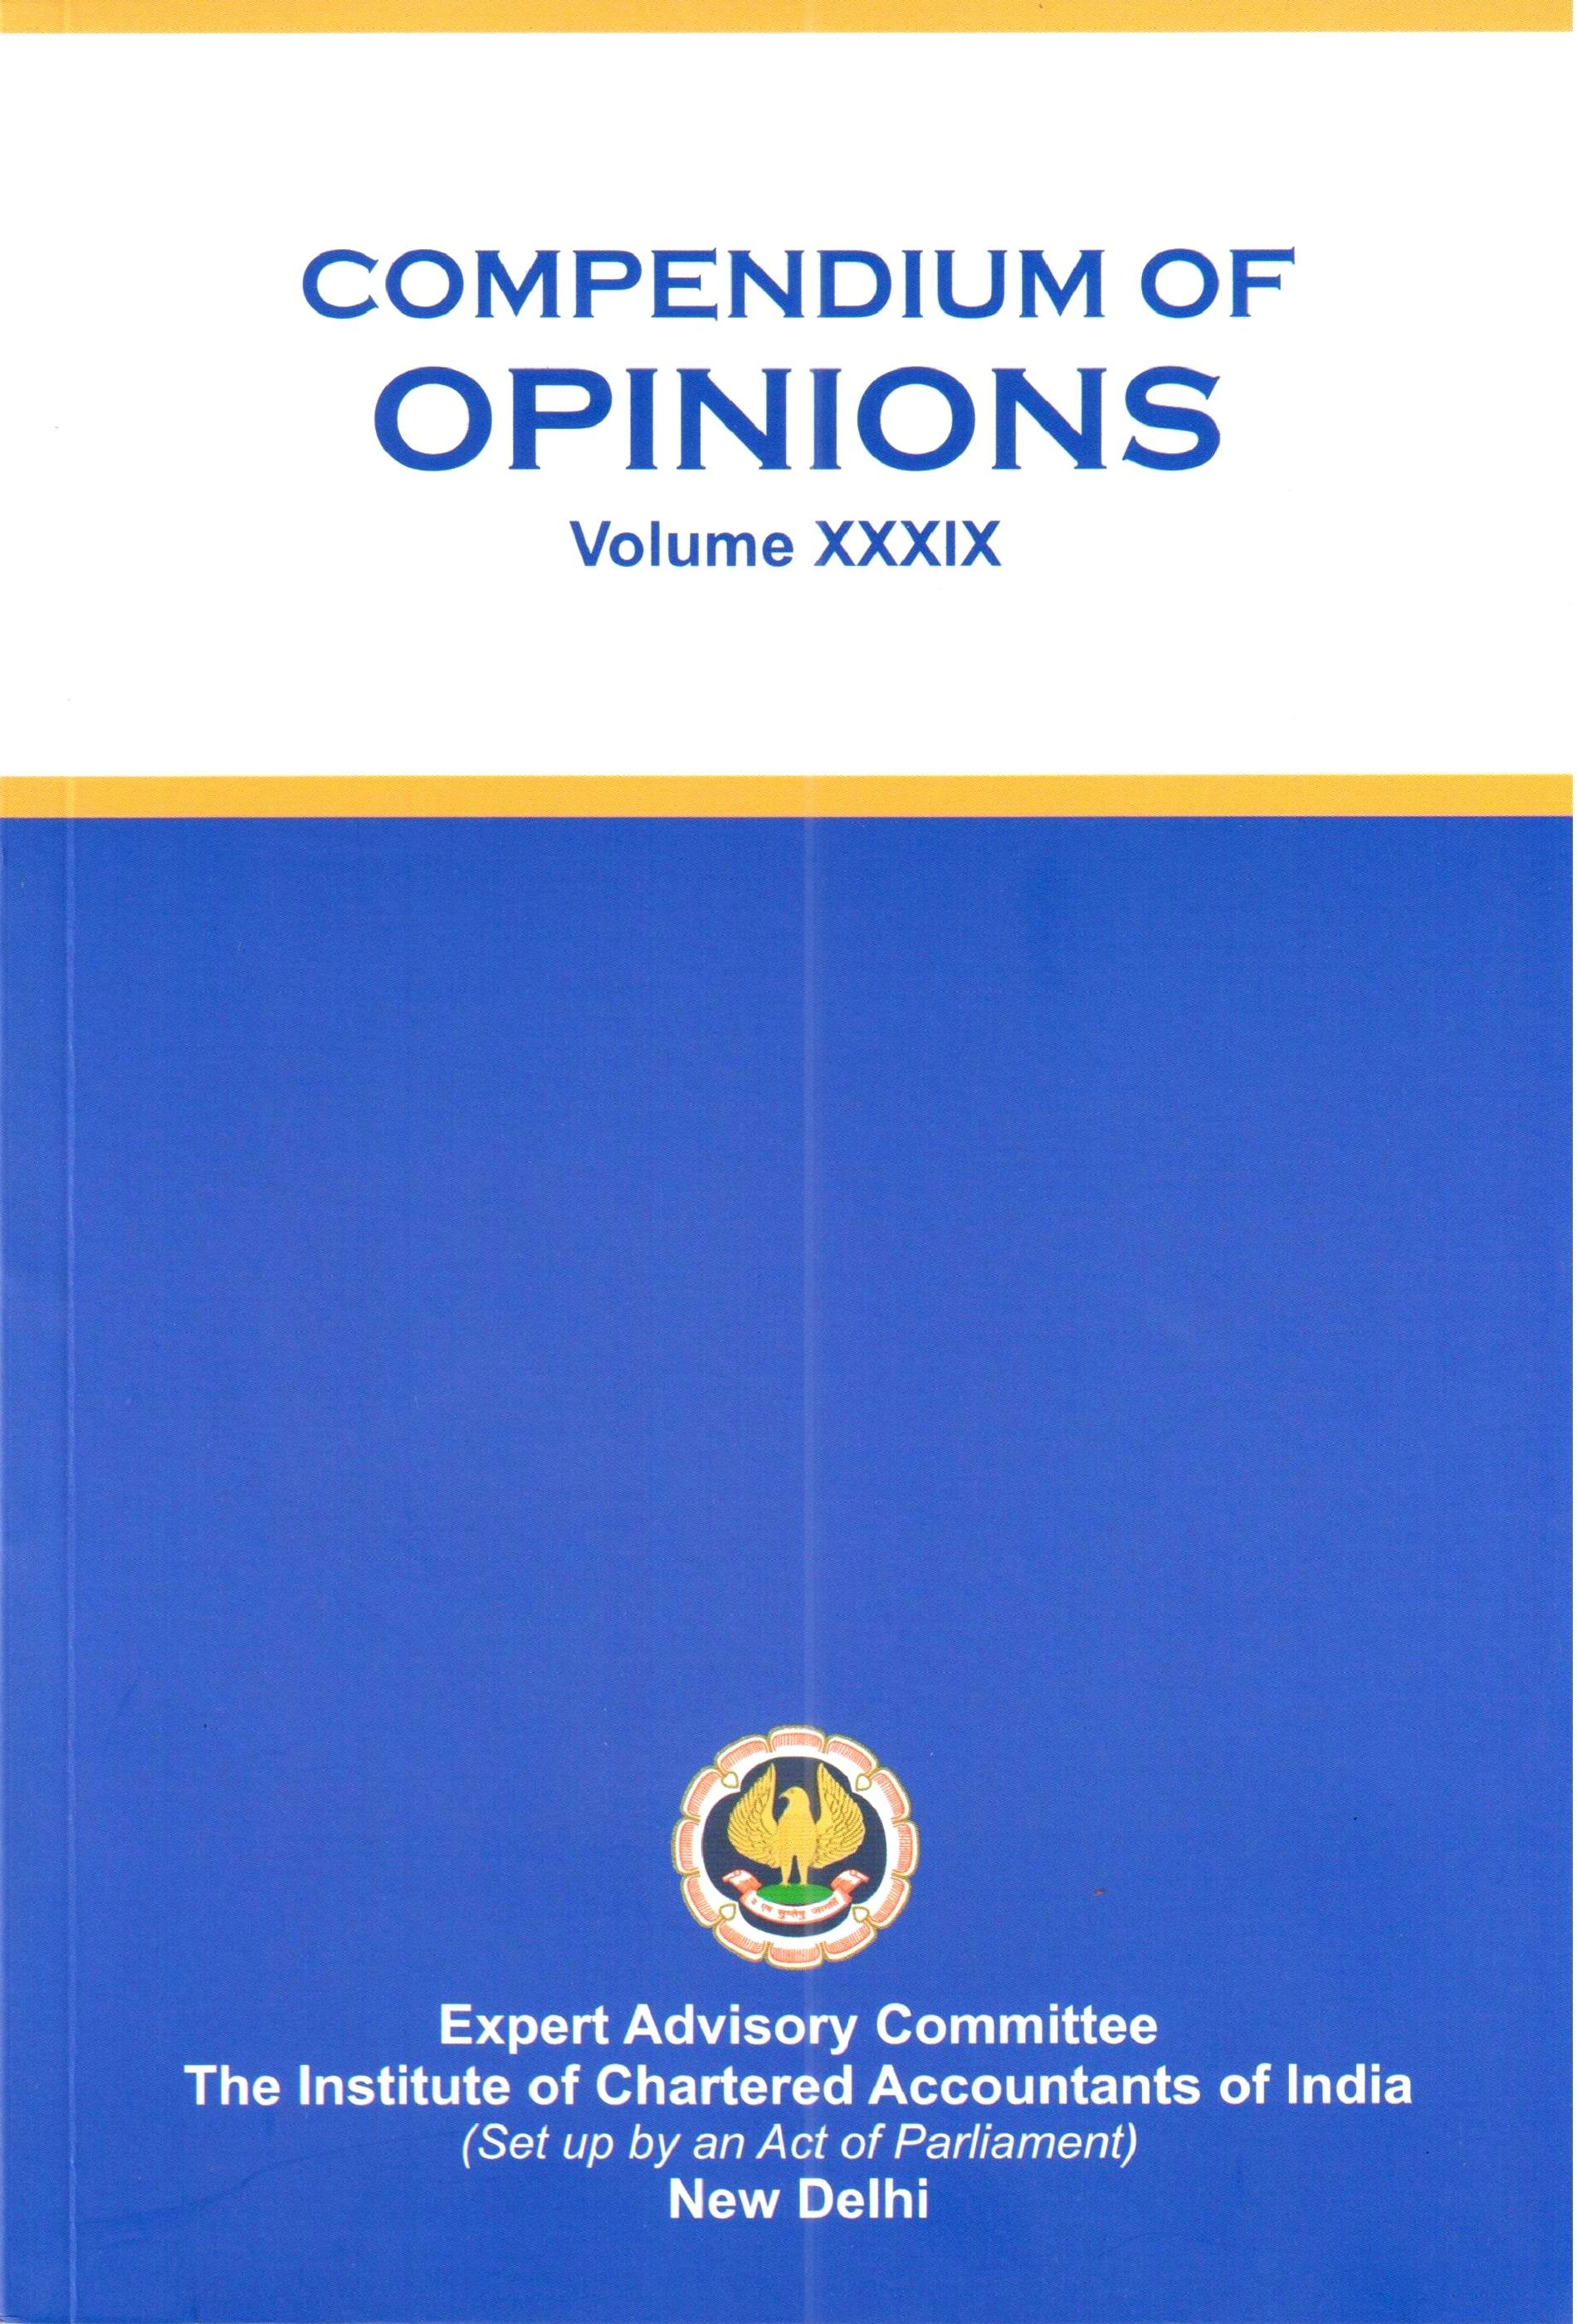 Compendium of Opinions Volume - XXXIX (2021)